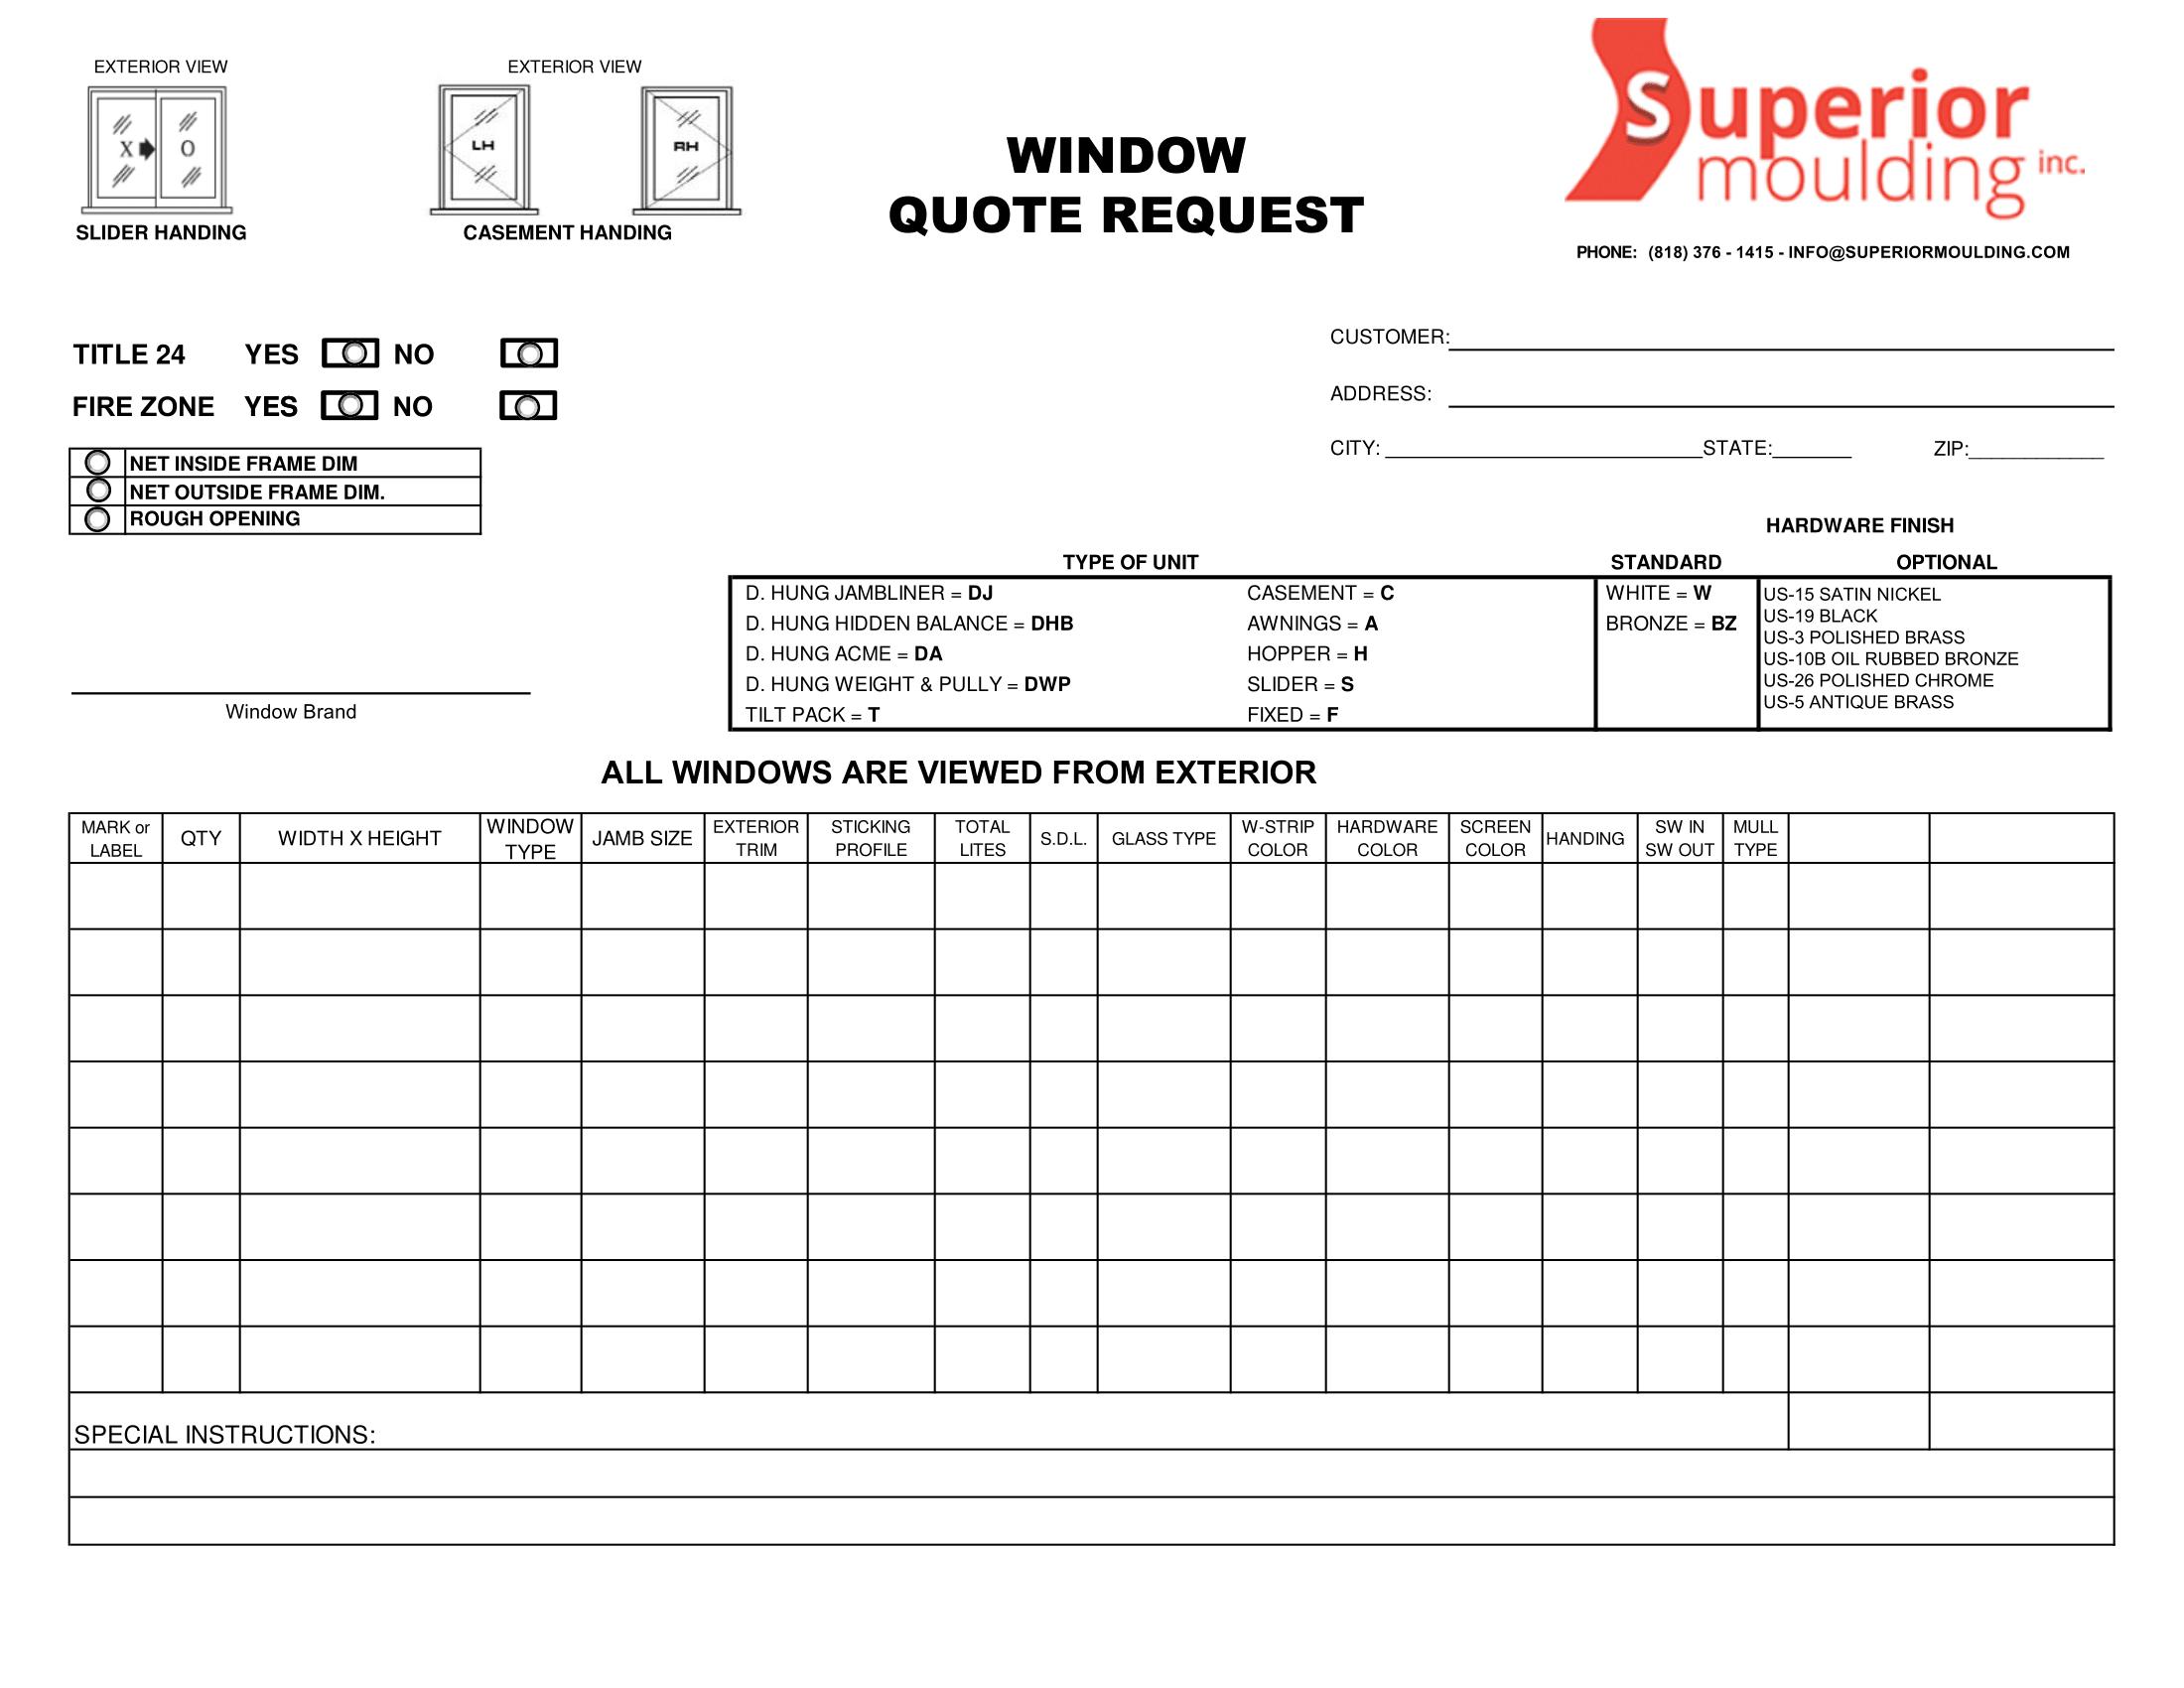 SMI-Windows-Interactive8.12.2020 (1)-1